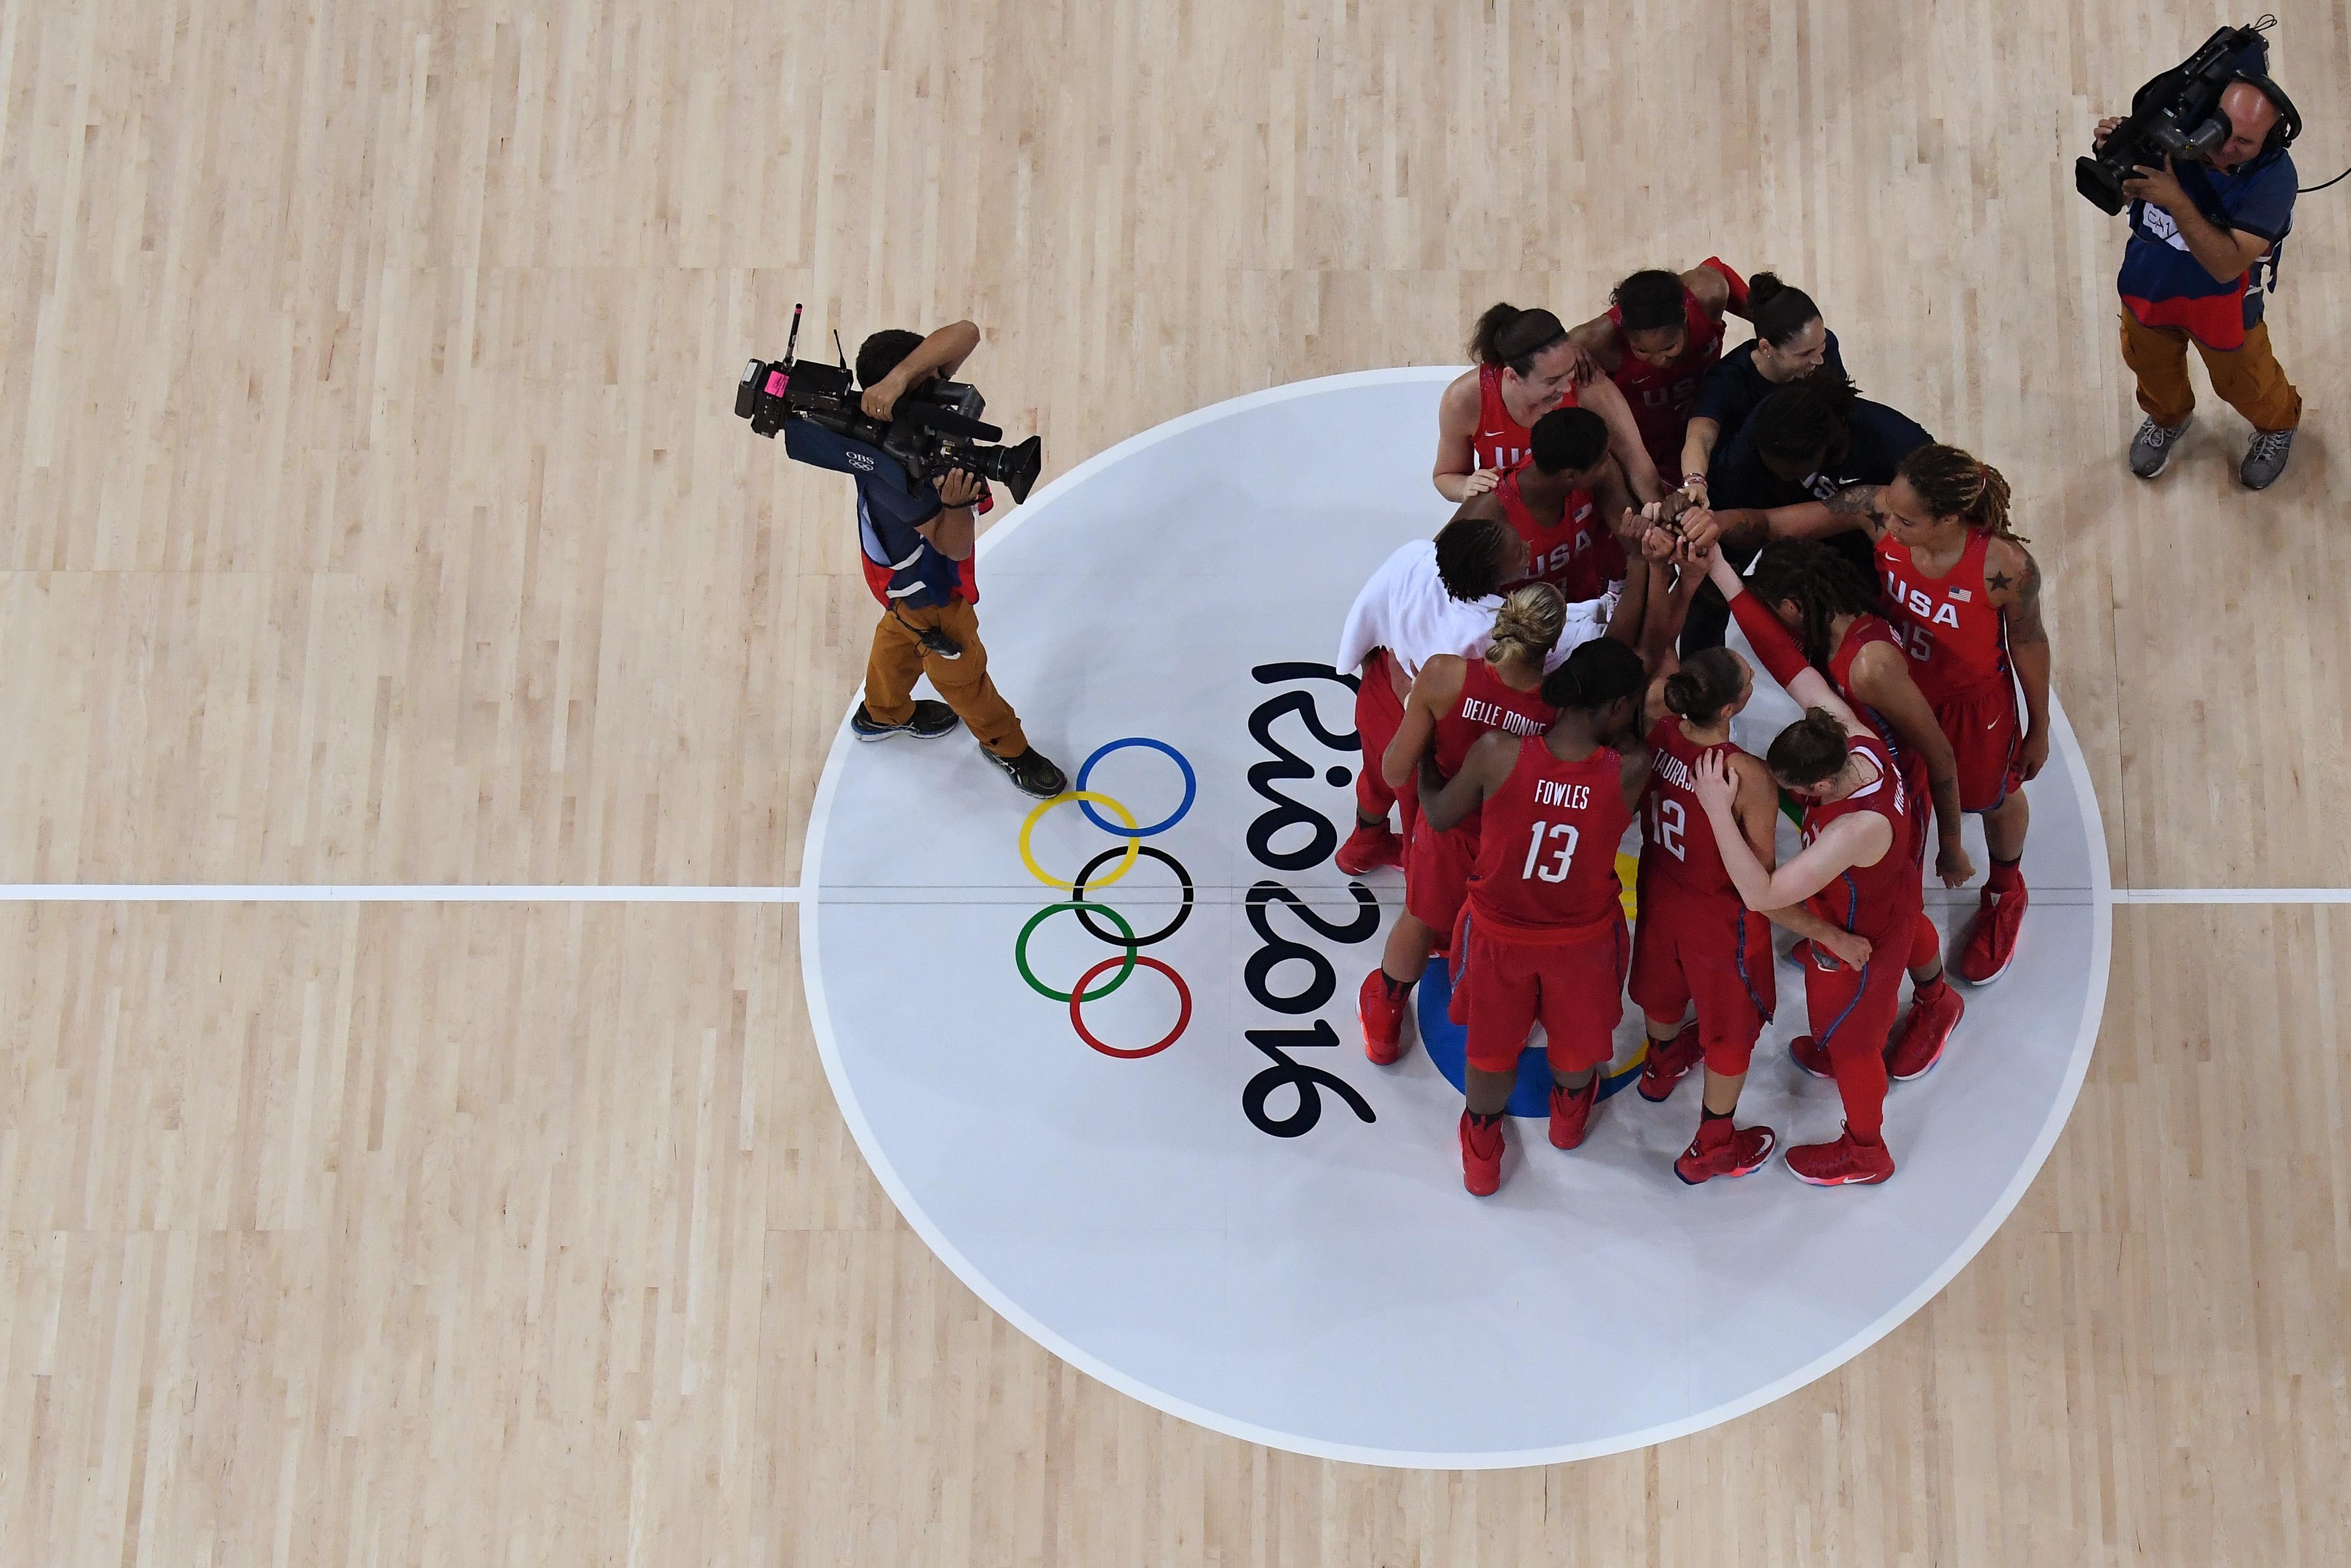 Basketball - Olympics: Day 13